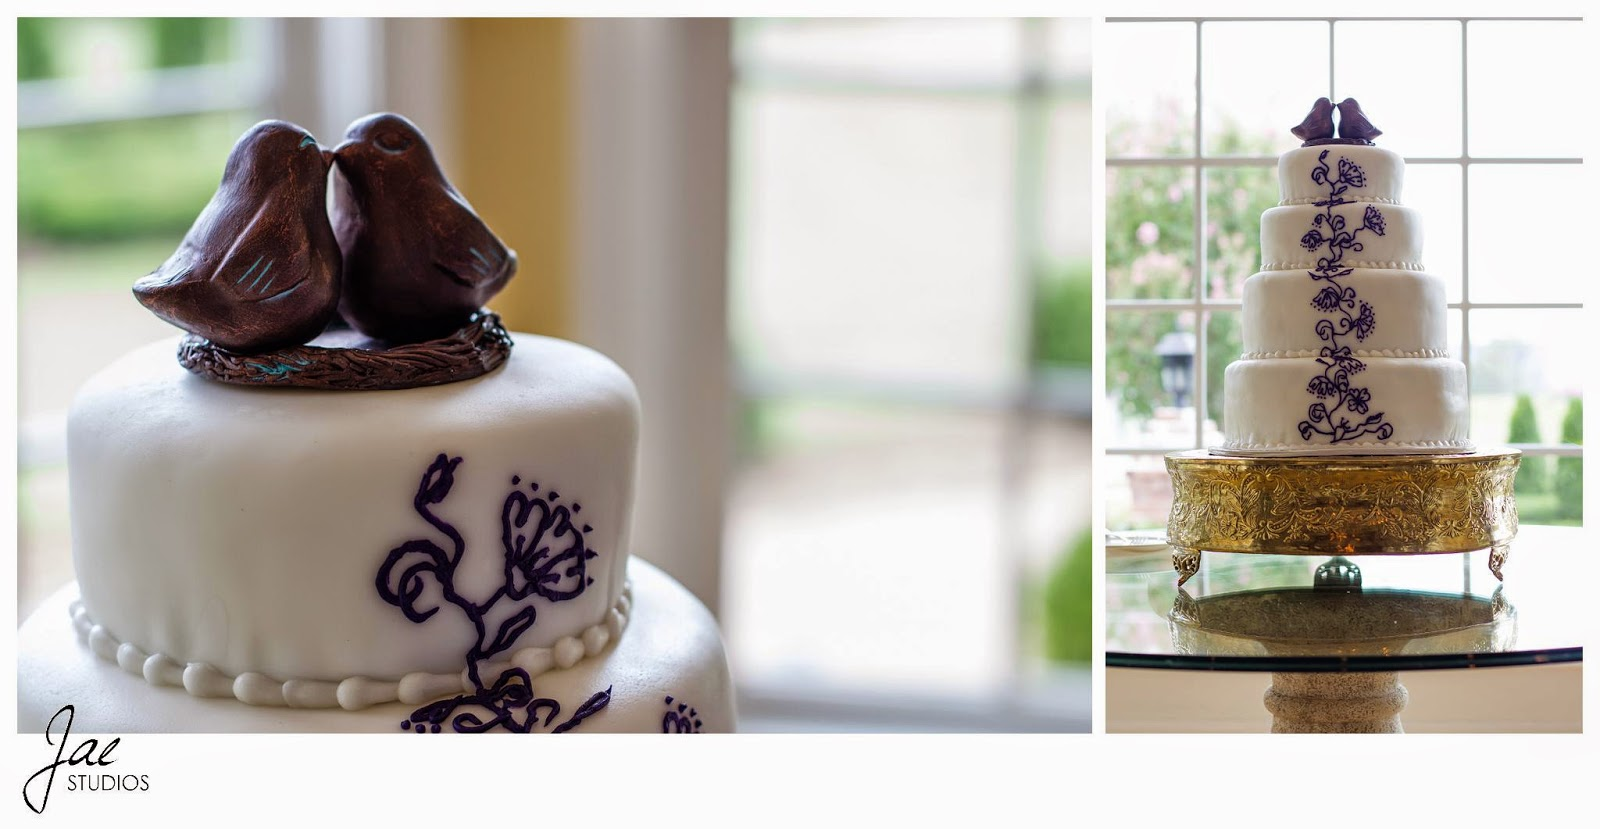 Jonathan and Julie, Bird cage, West Manor Estate, Wedding, Lynchburg, Virginia, Jae Studios, chocolate, birds, cake, gold, white, pearls, blue flowers, window